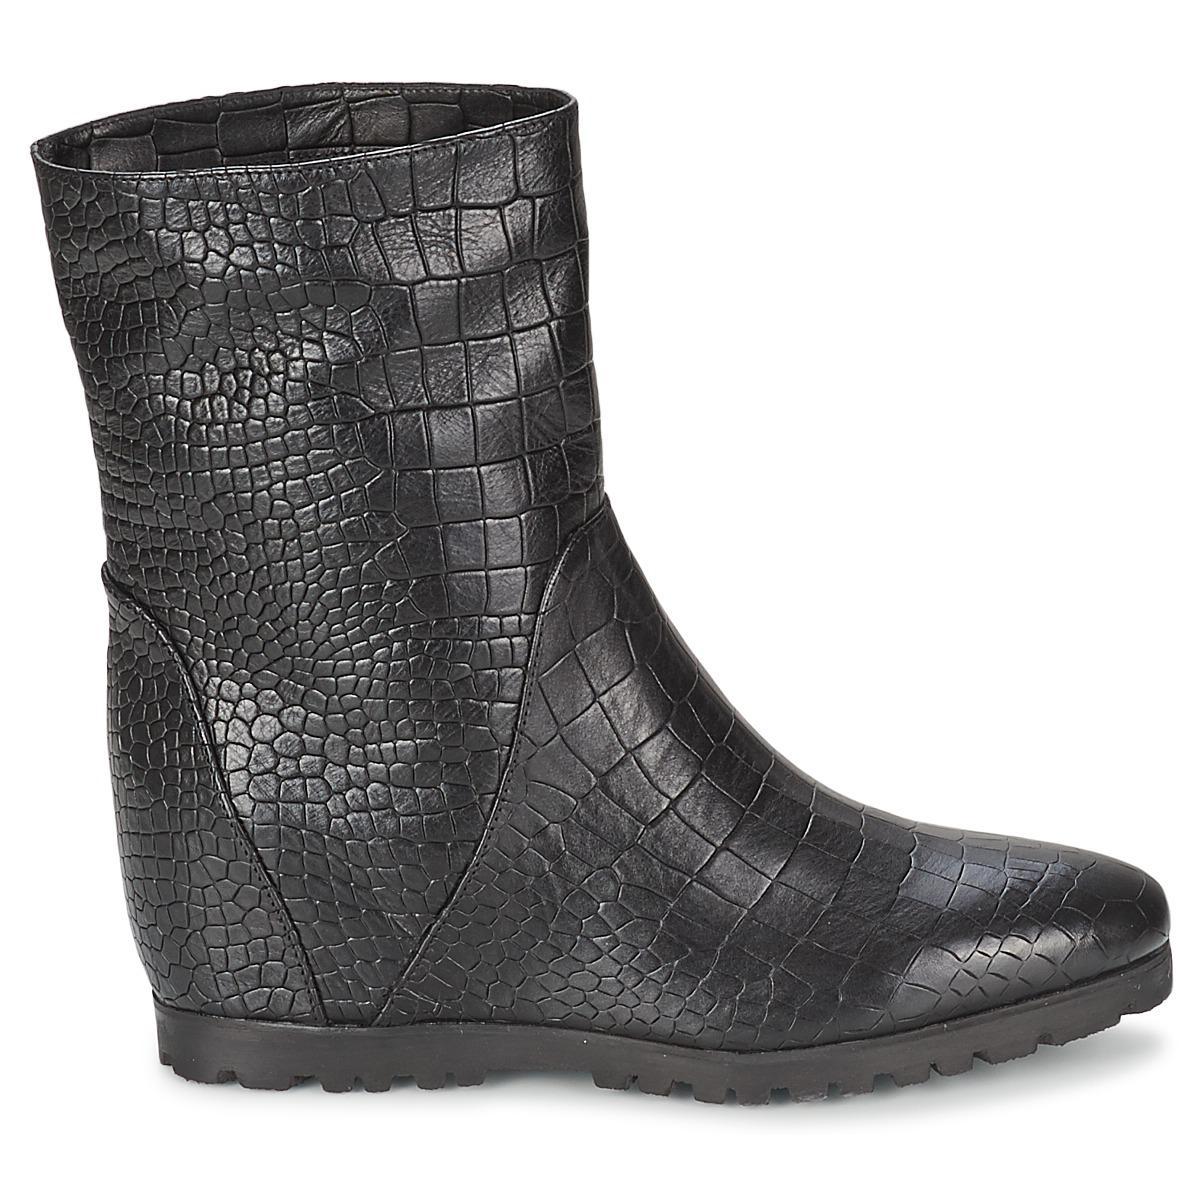 Alberto Gozzi GRINGO MANDORLA women's Low Ankle Boots in Choice For Sale Limited Edition Online Unisex e1J19